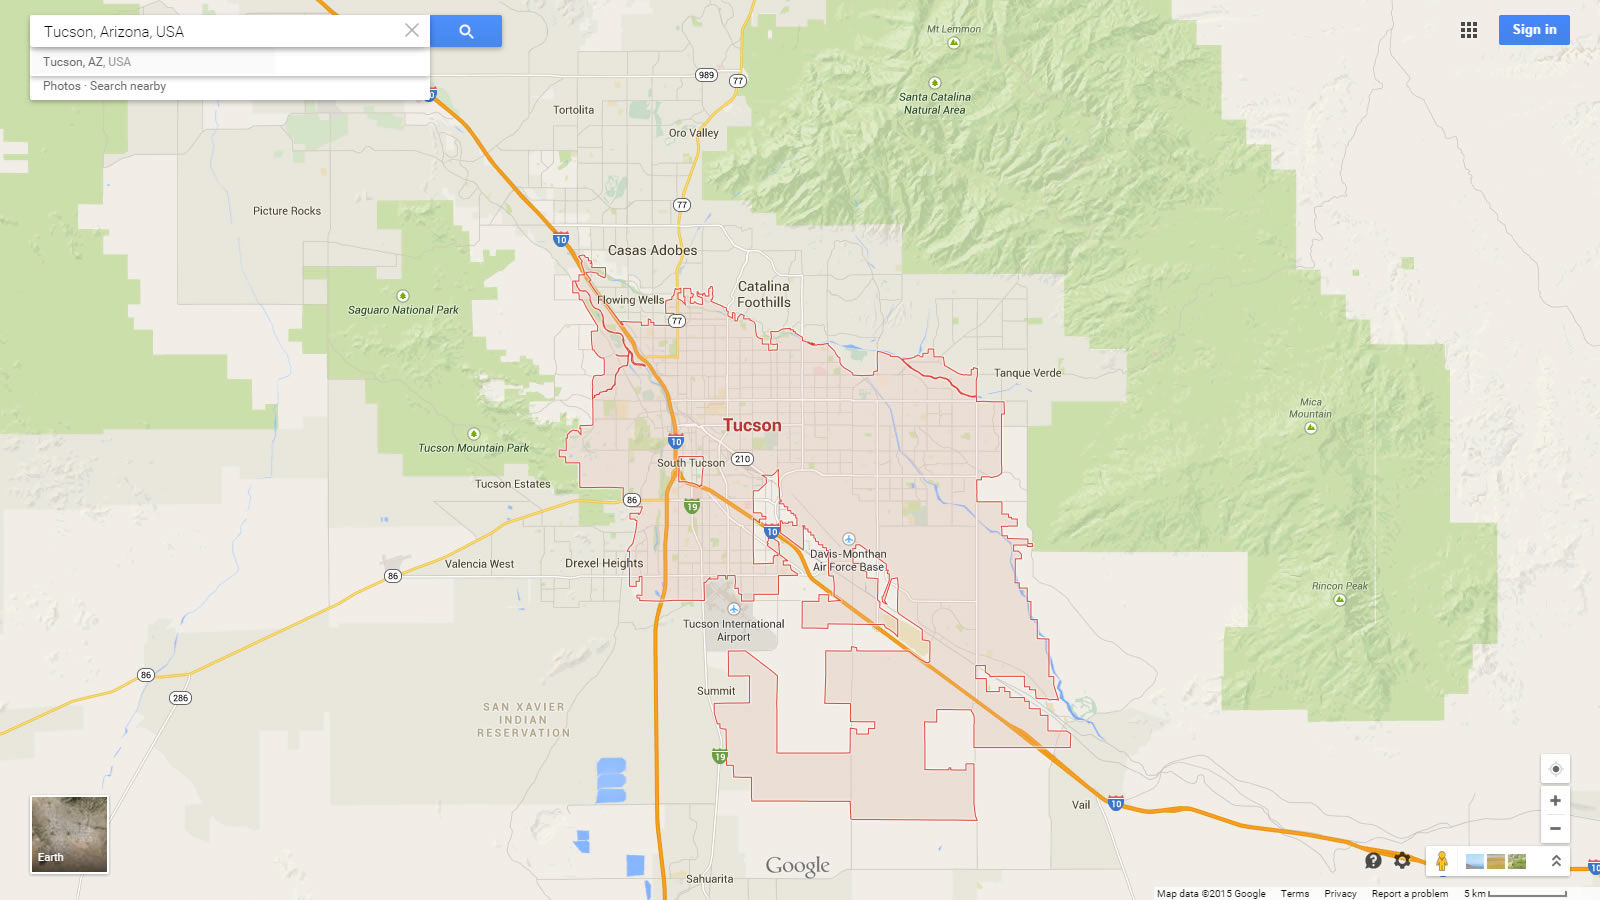 map of tucson tucson arizona map usa